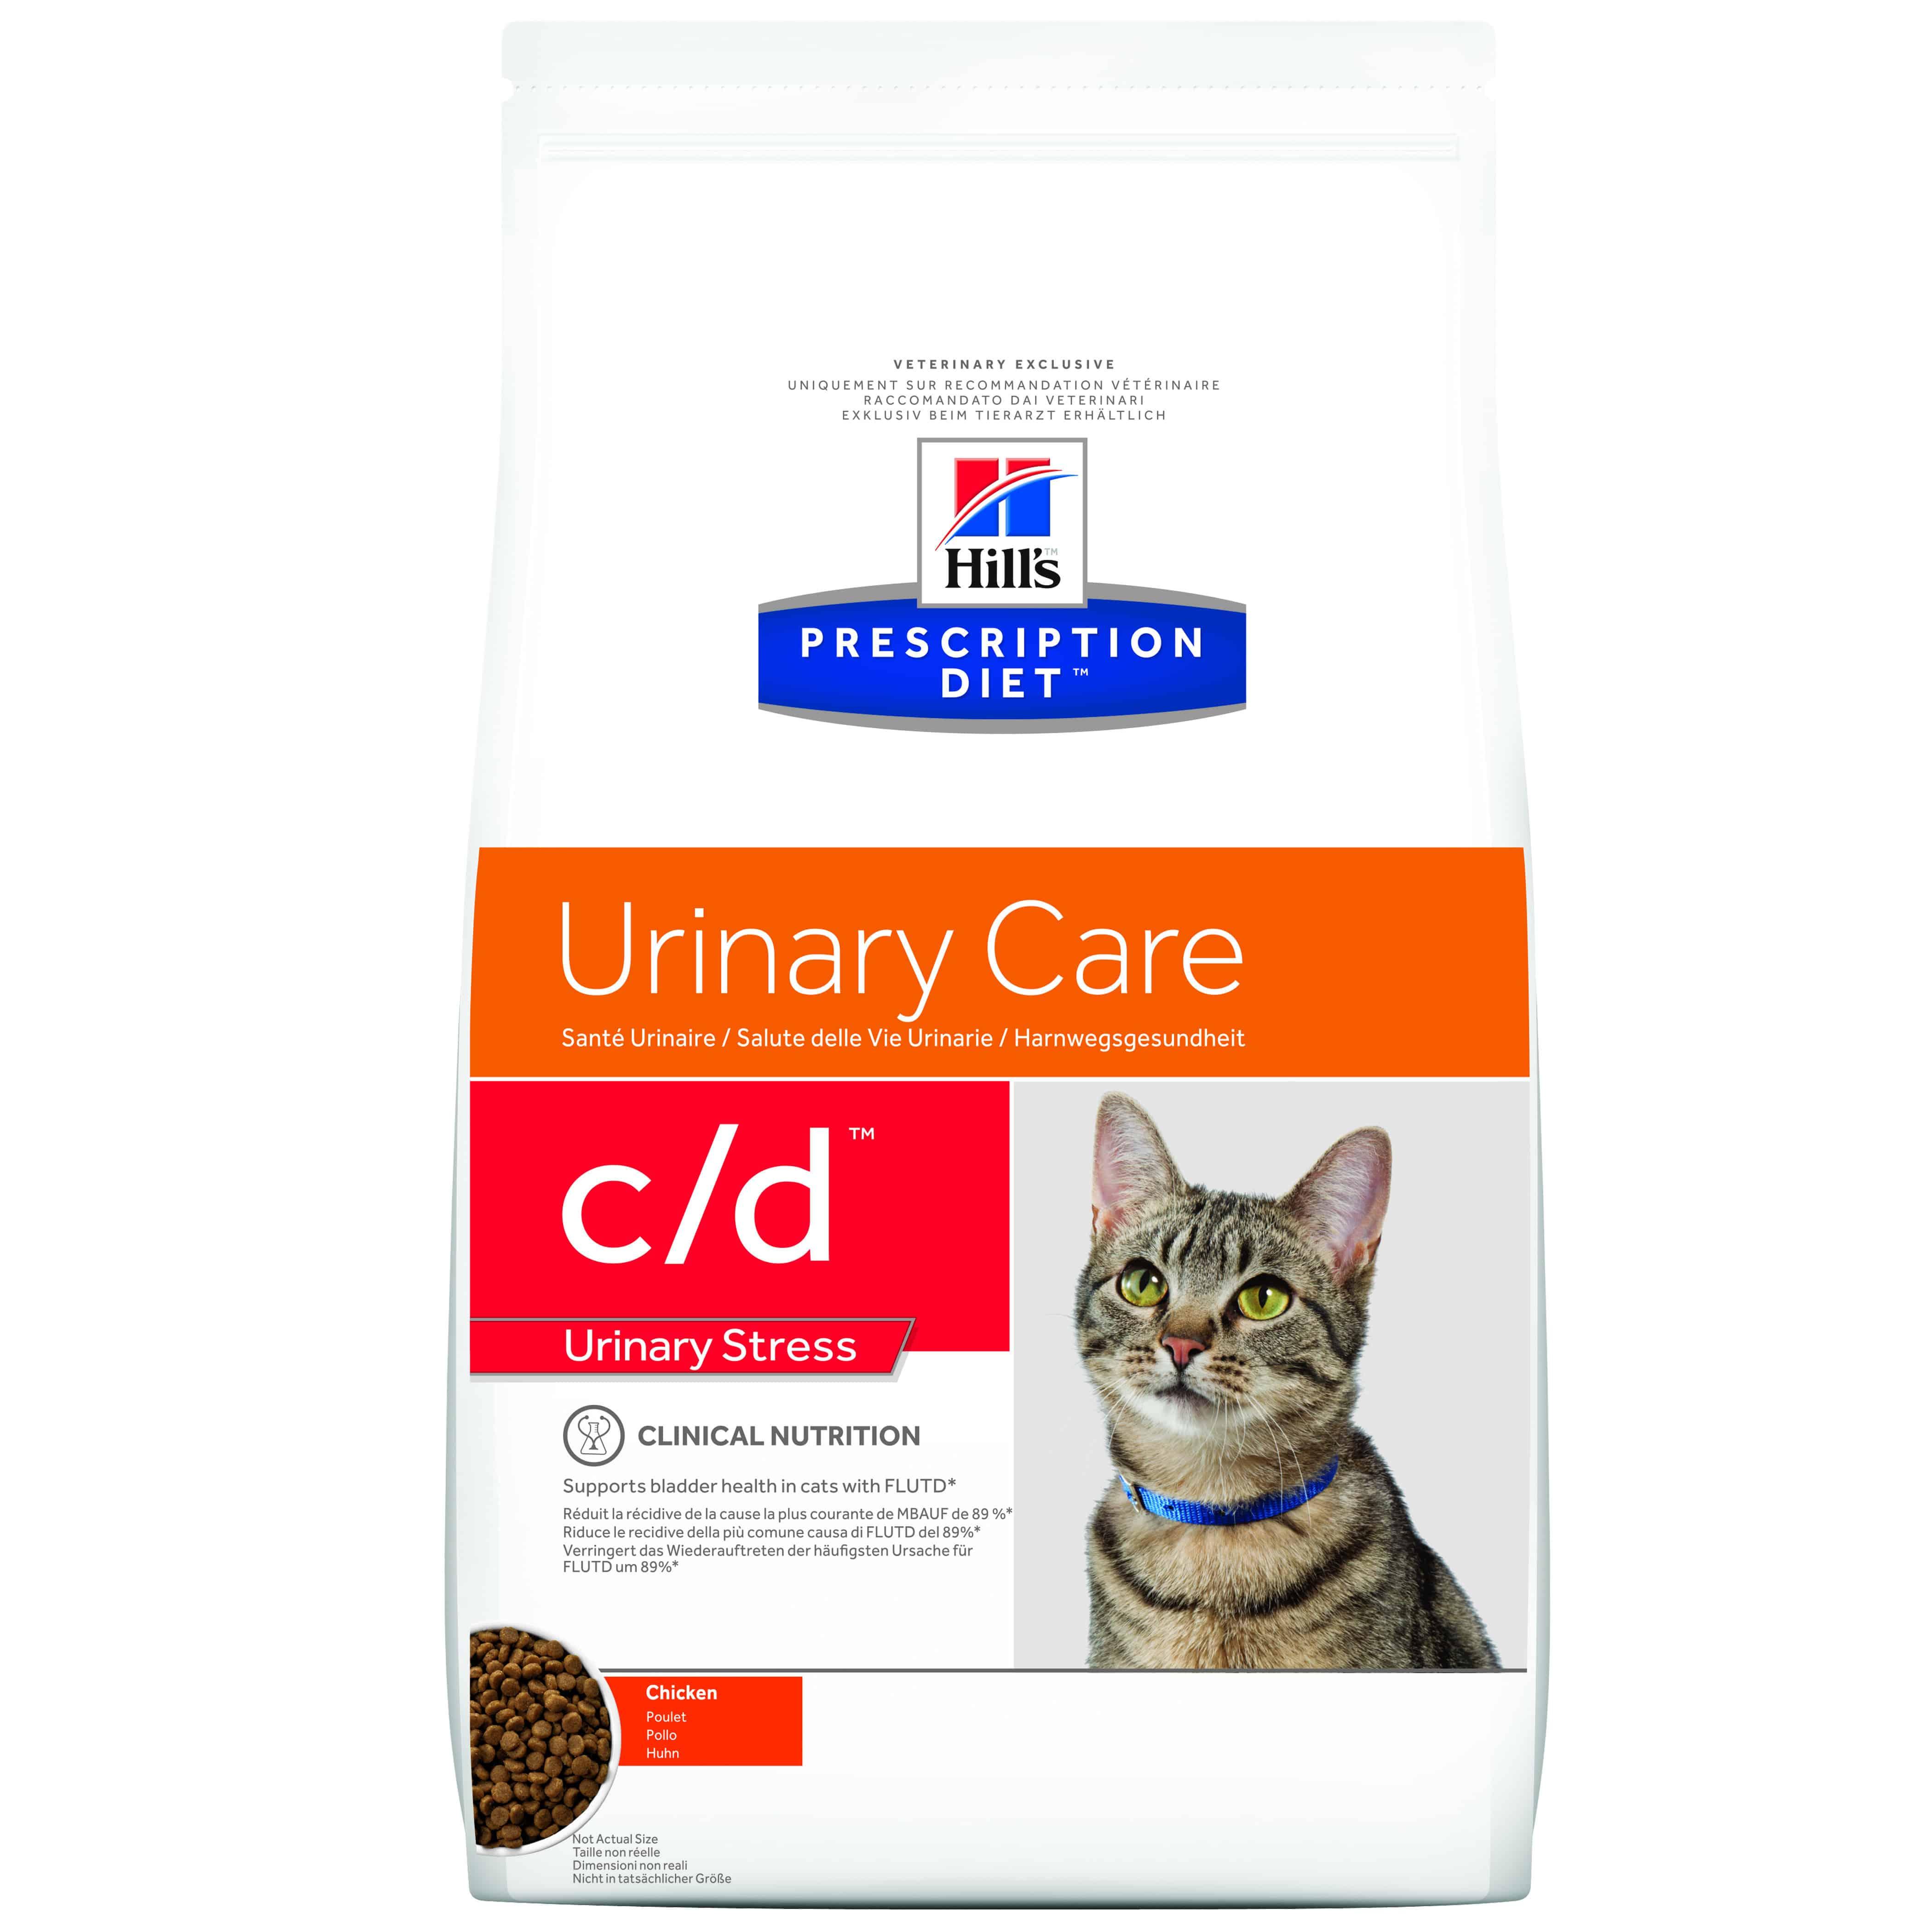 Urinary So Feline Cat Food